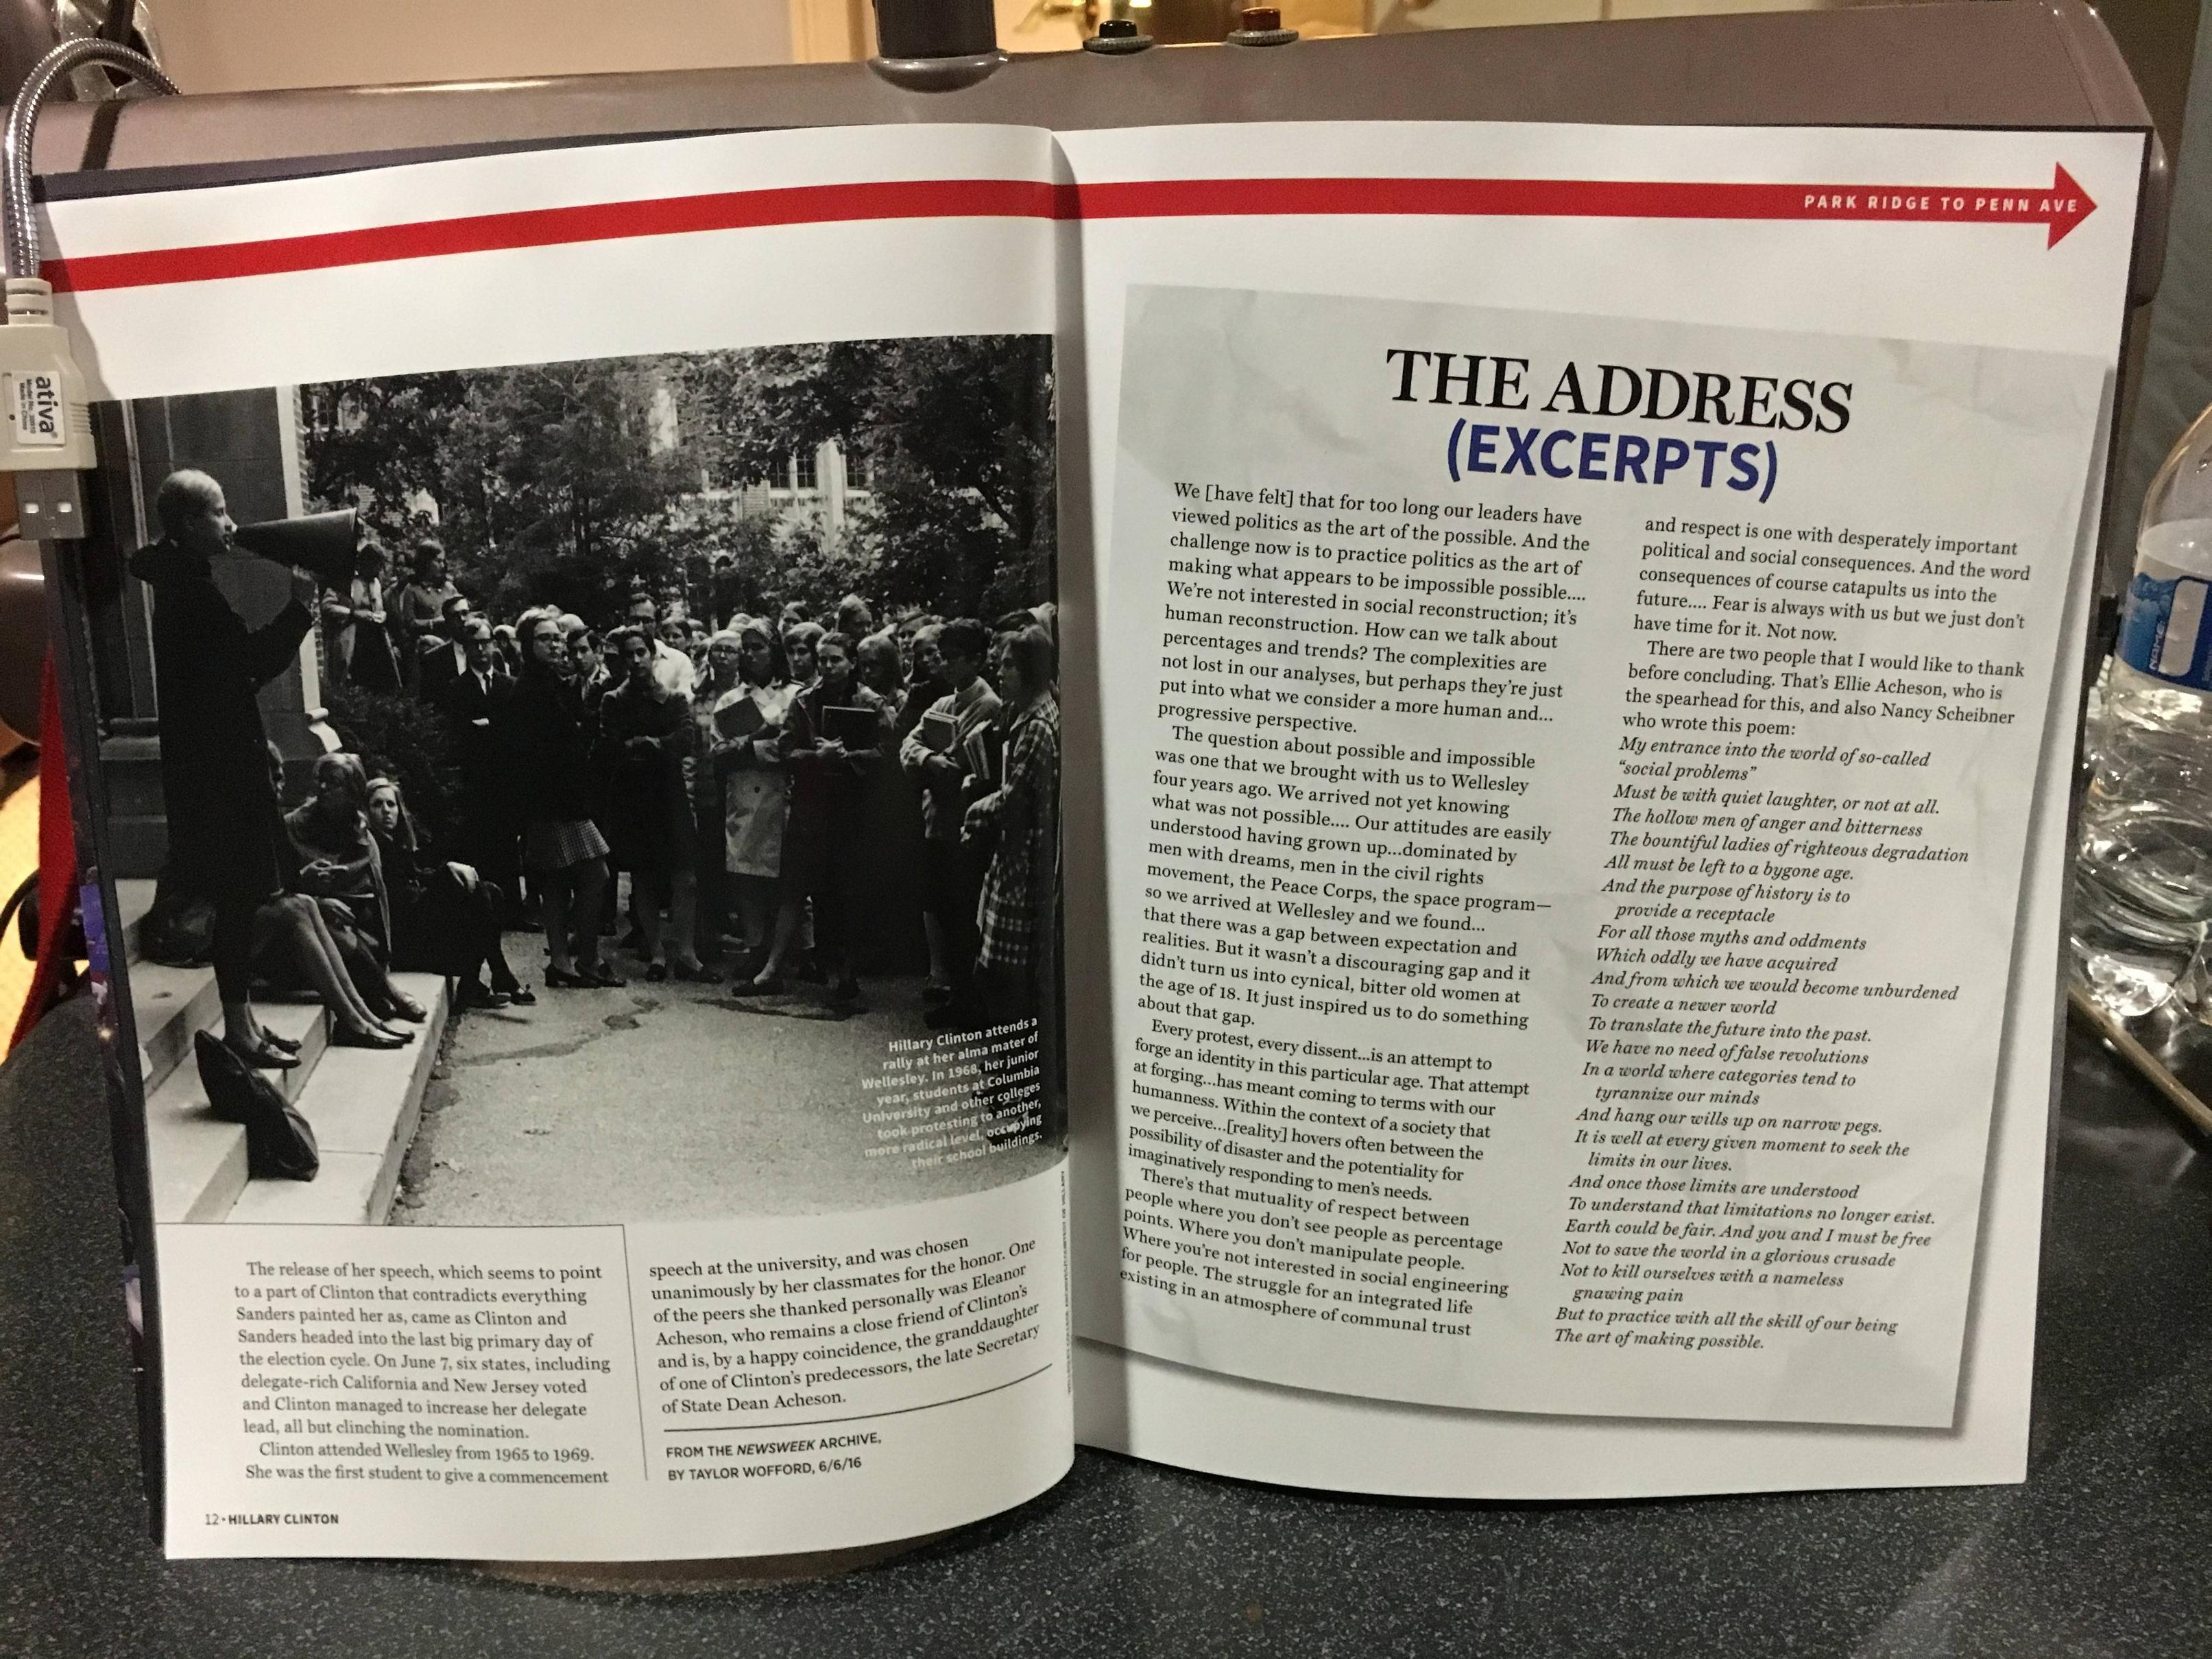 newsweek-madame-hillary-clinton-page-6